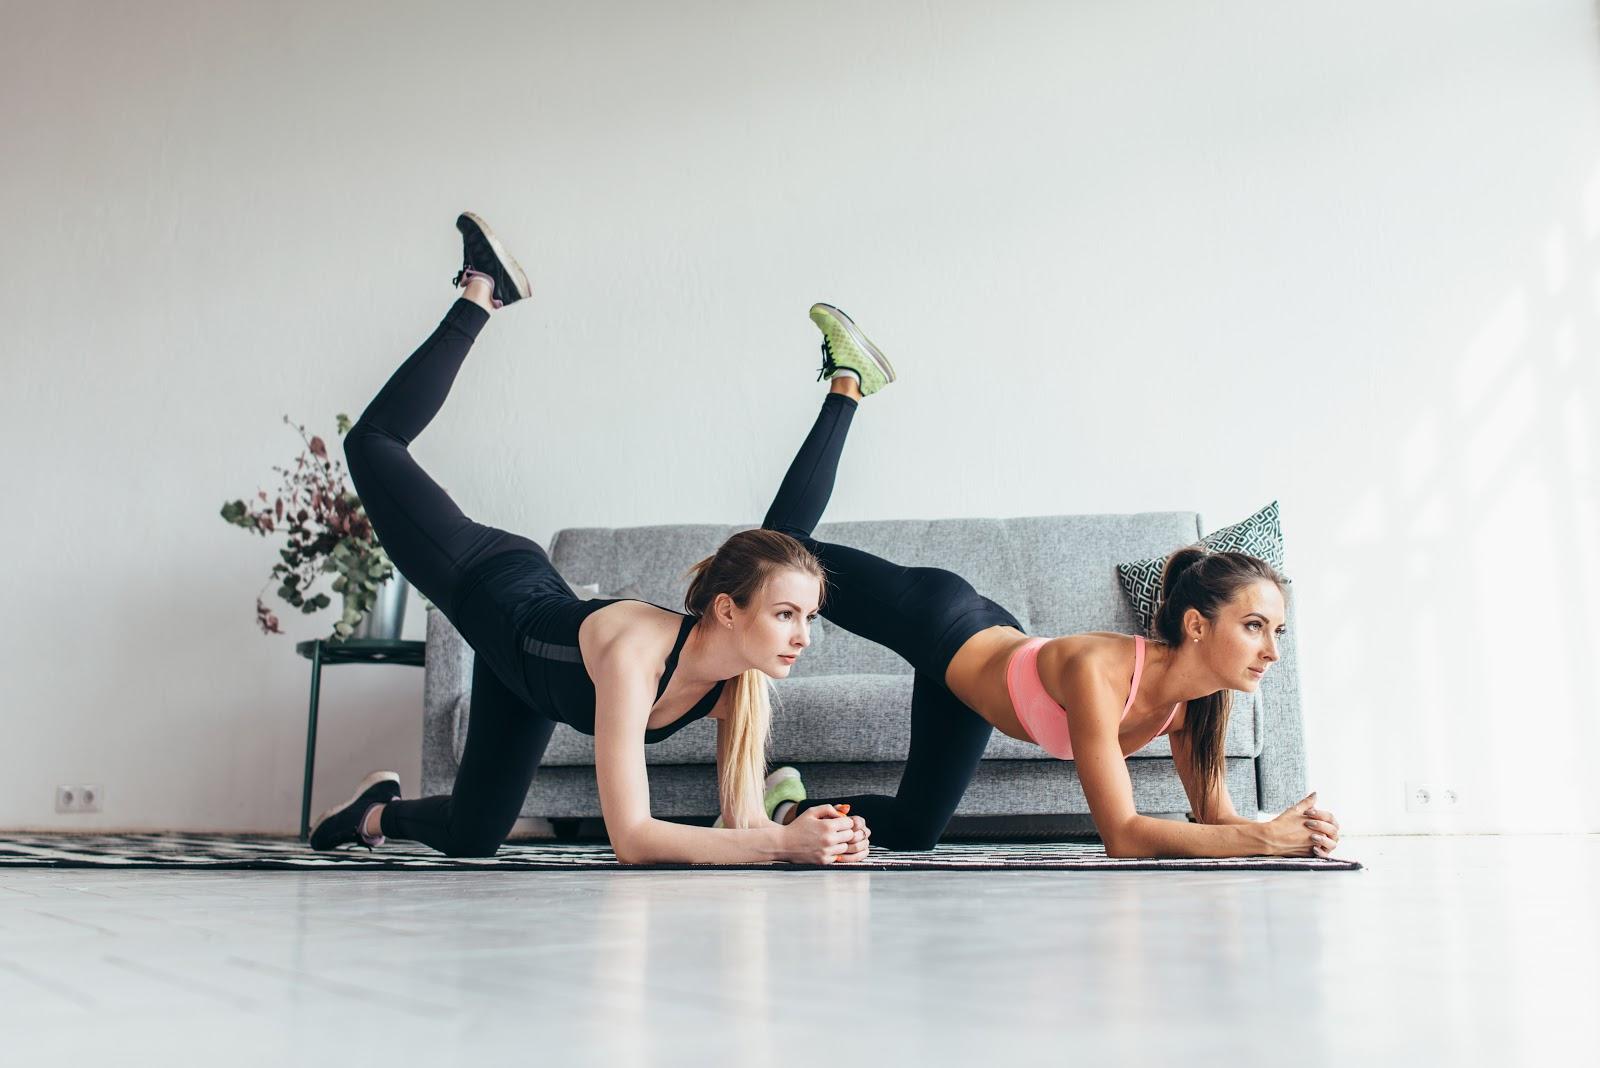 Glute Exercises for Runners: Donkey Kick